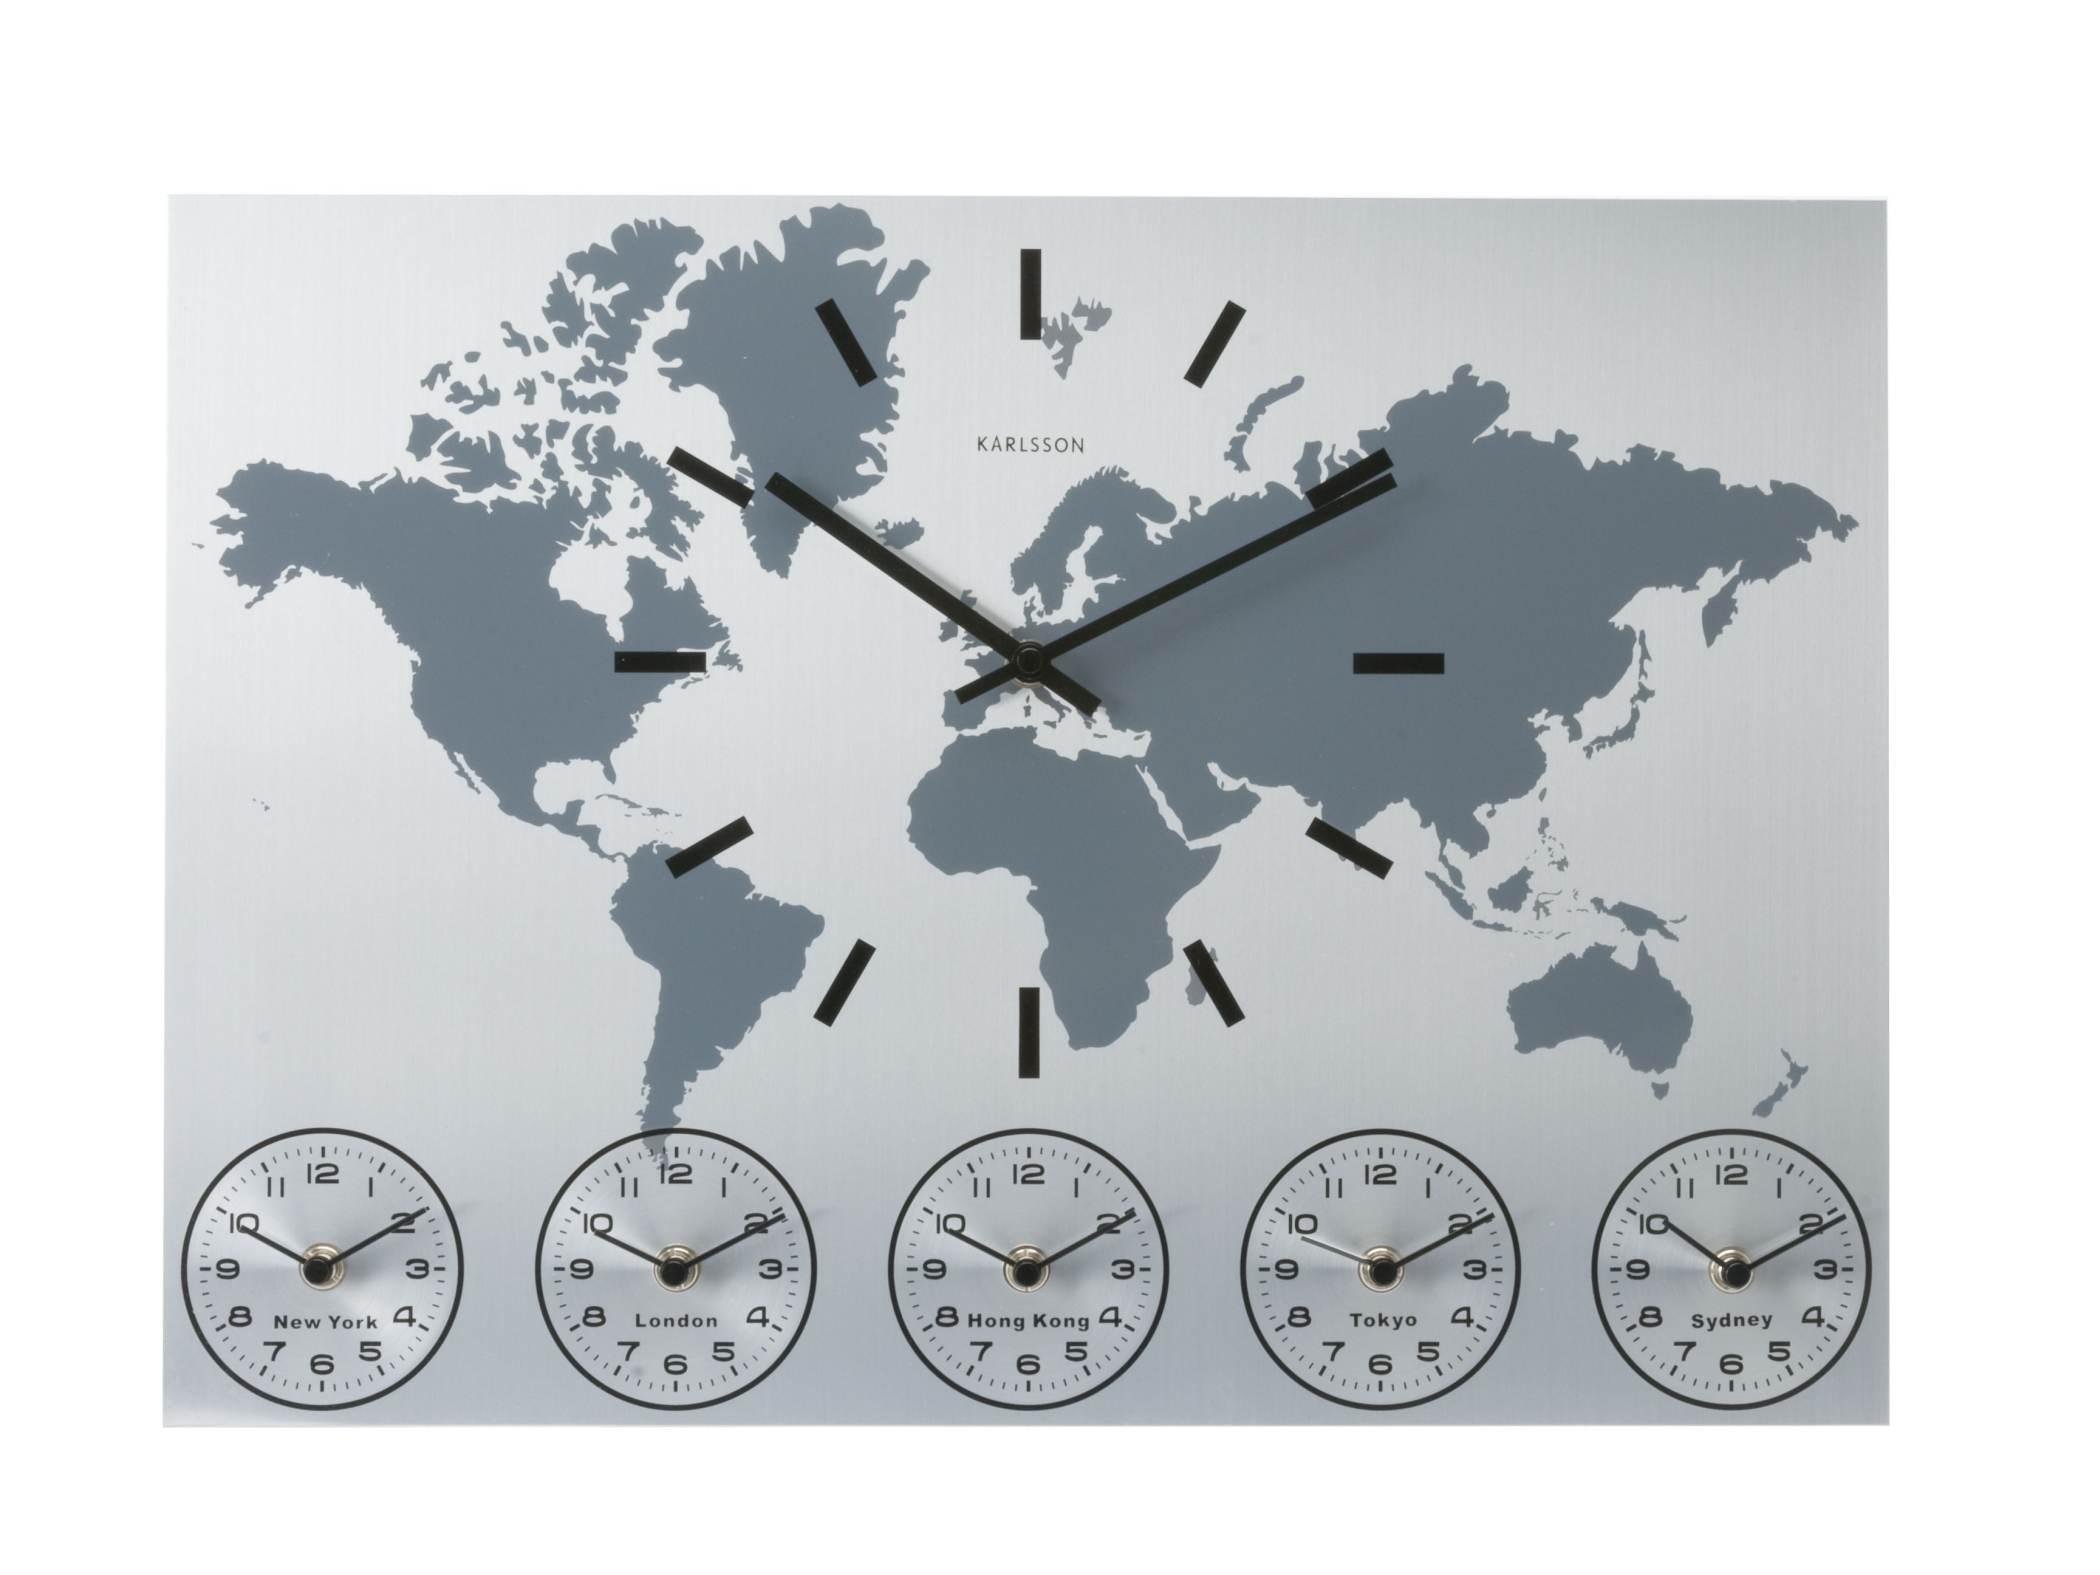 Karlsson Wall Clock Foter